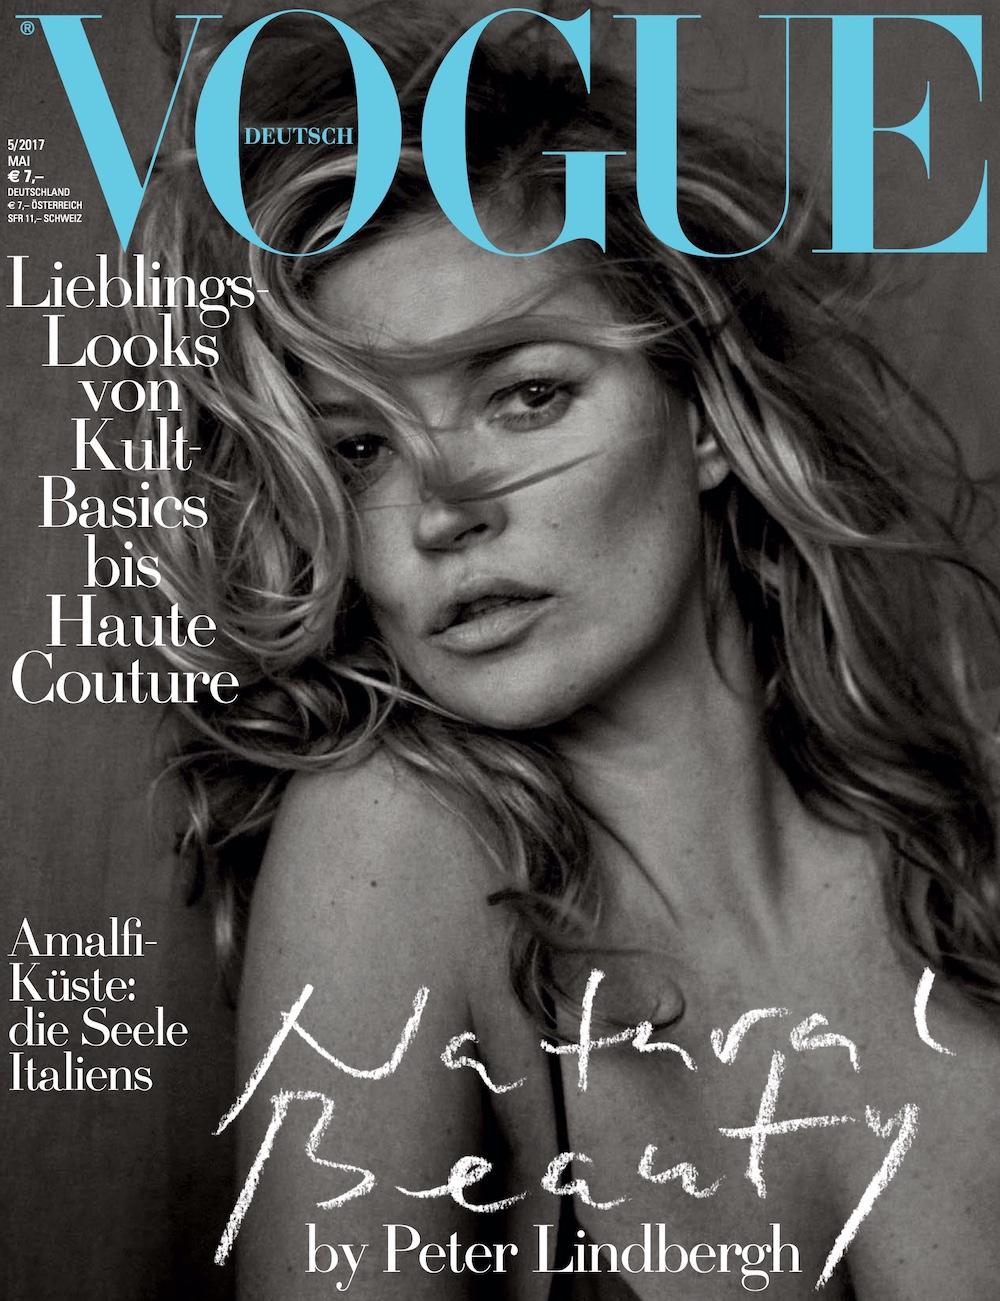 Vogue 2017-05